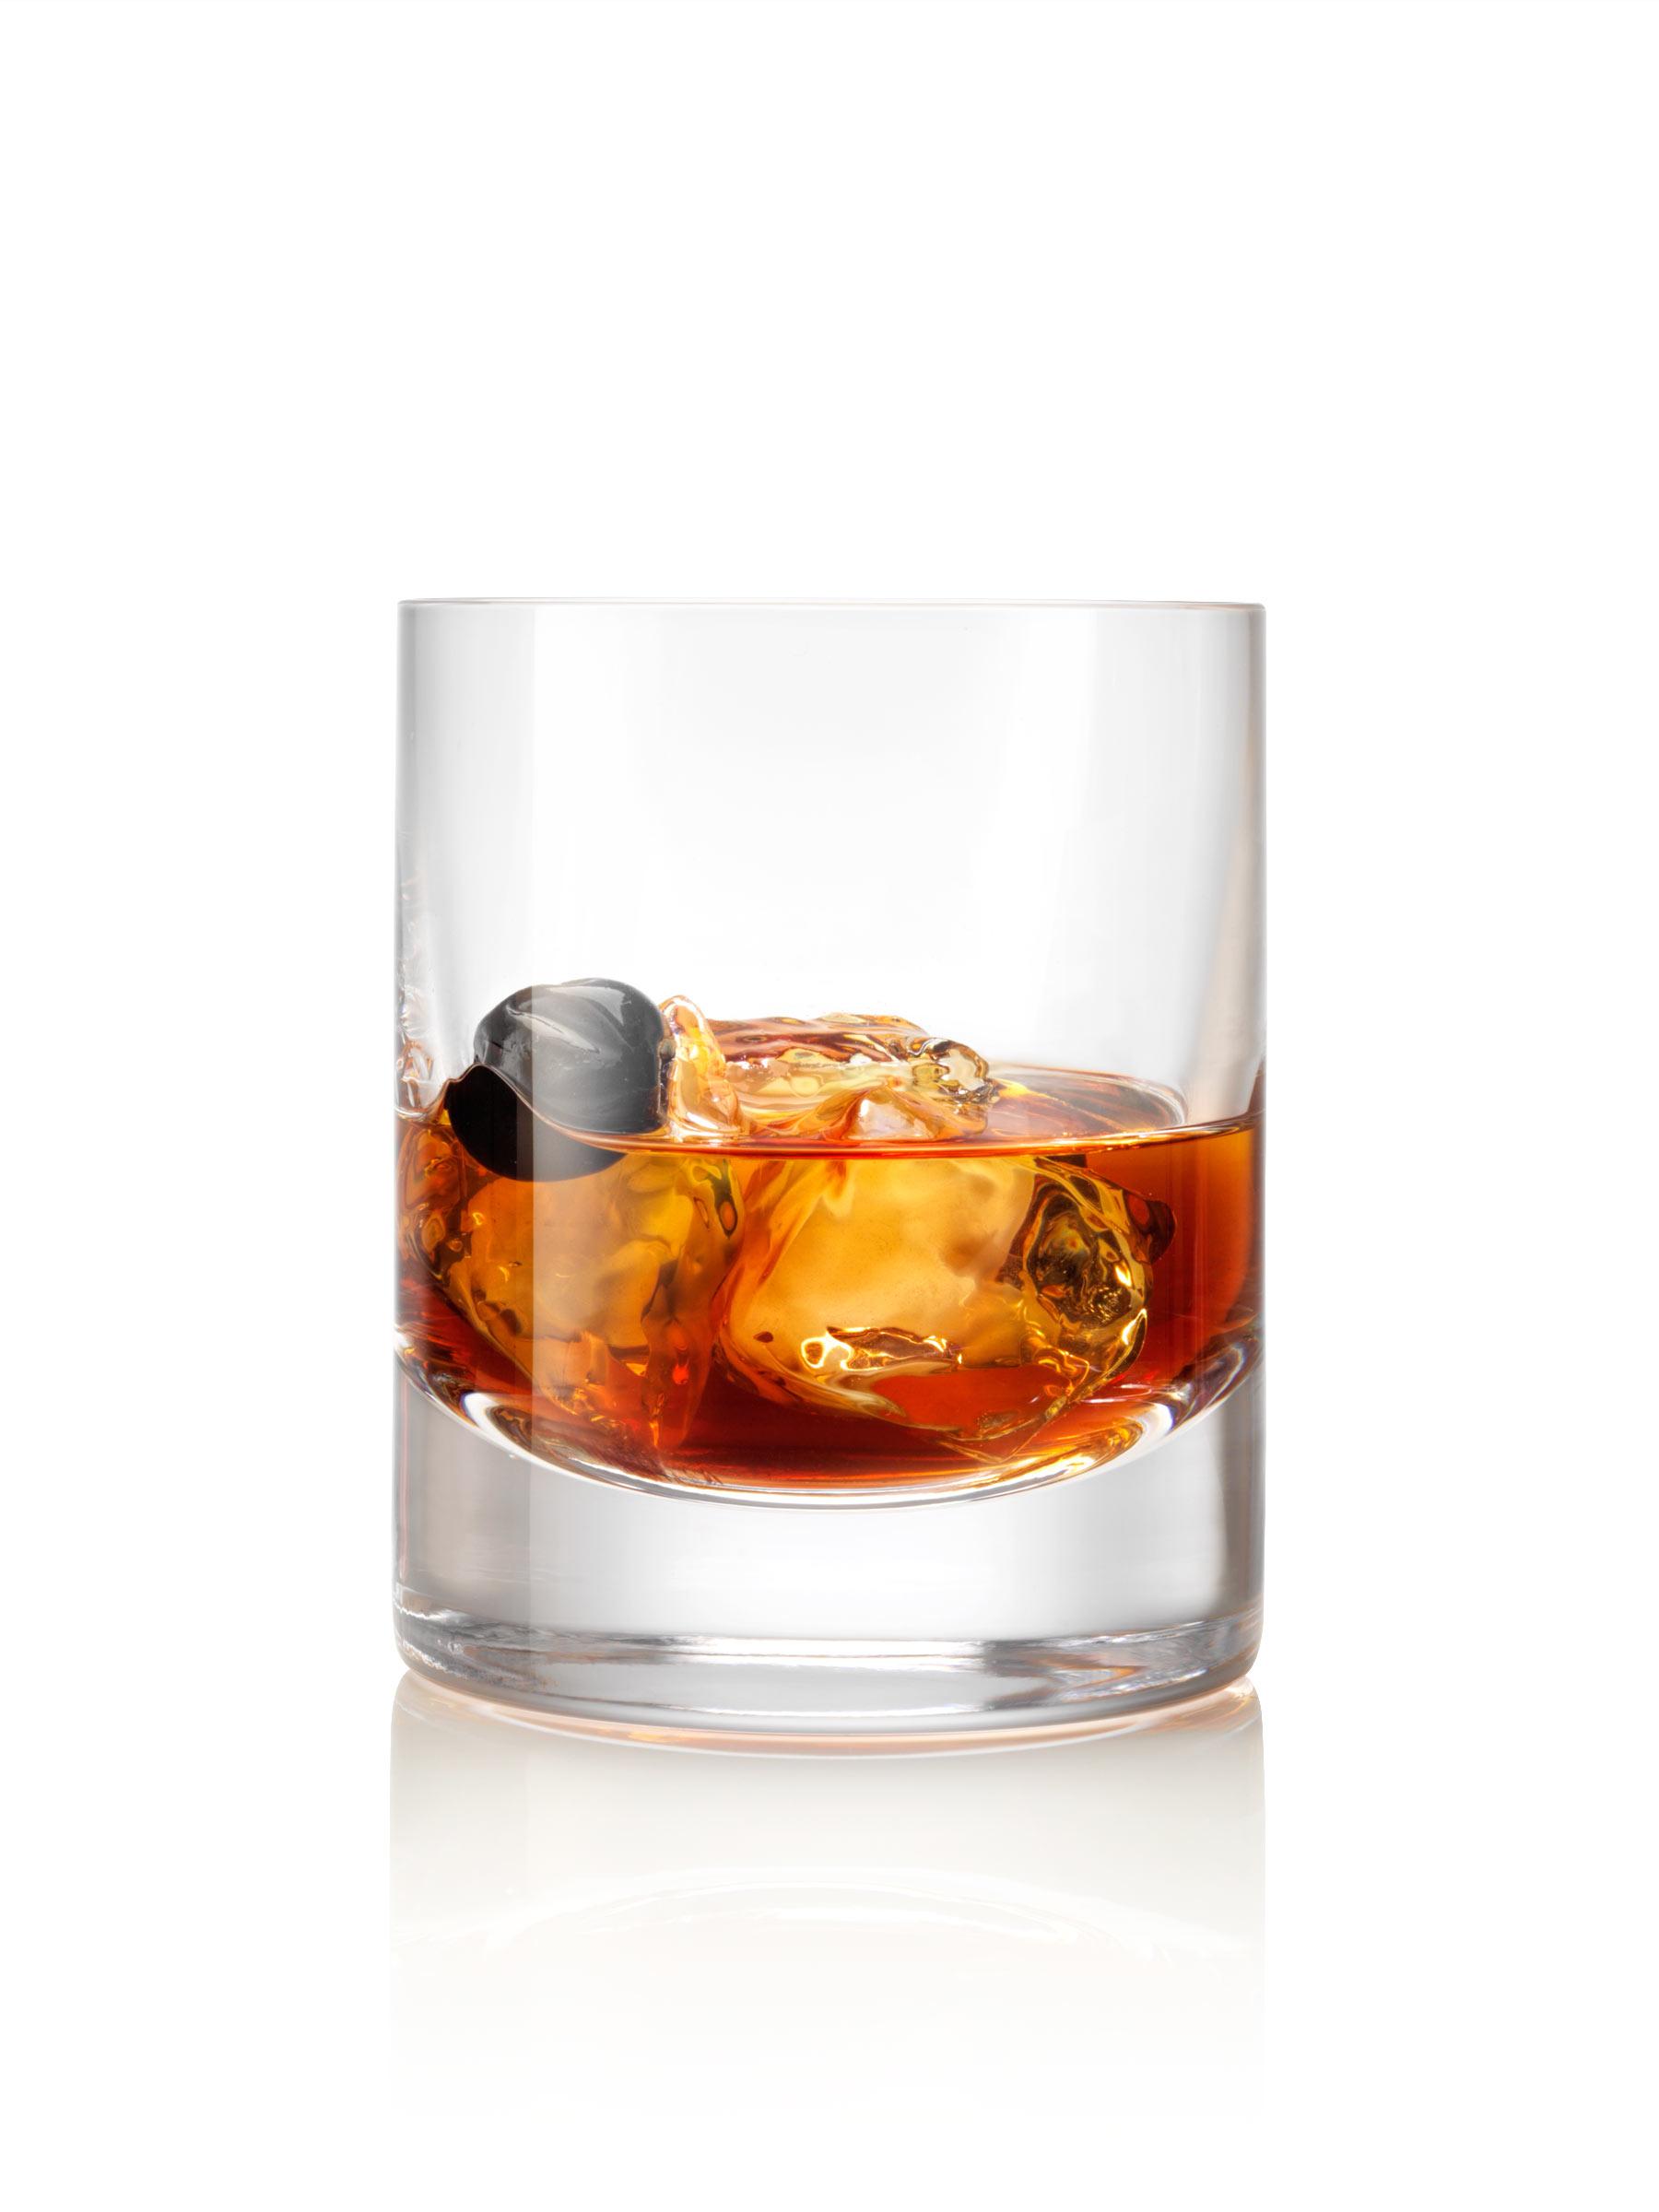 drink photography Packshot photography |Warren Ryley Photography